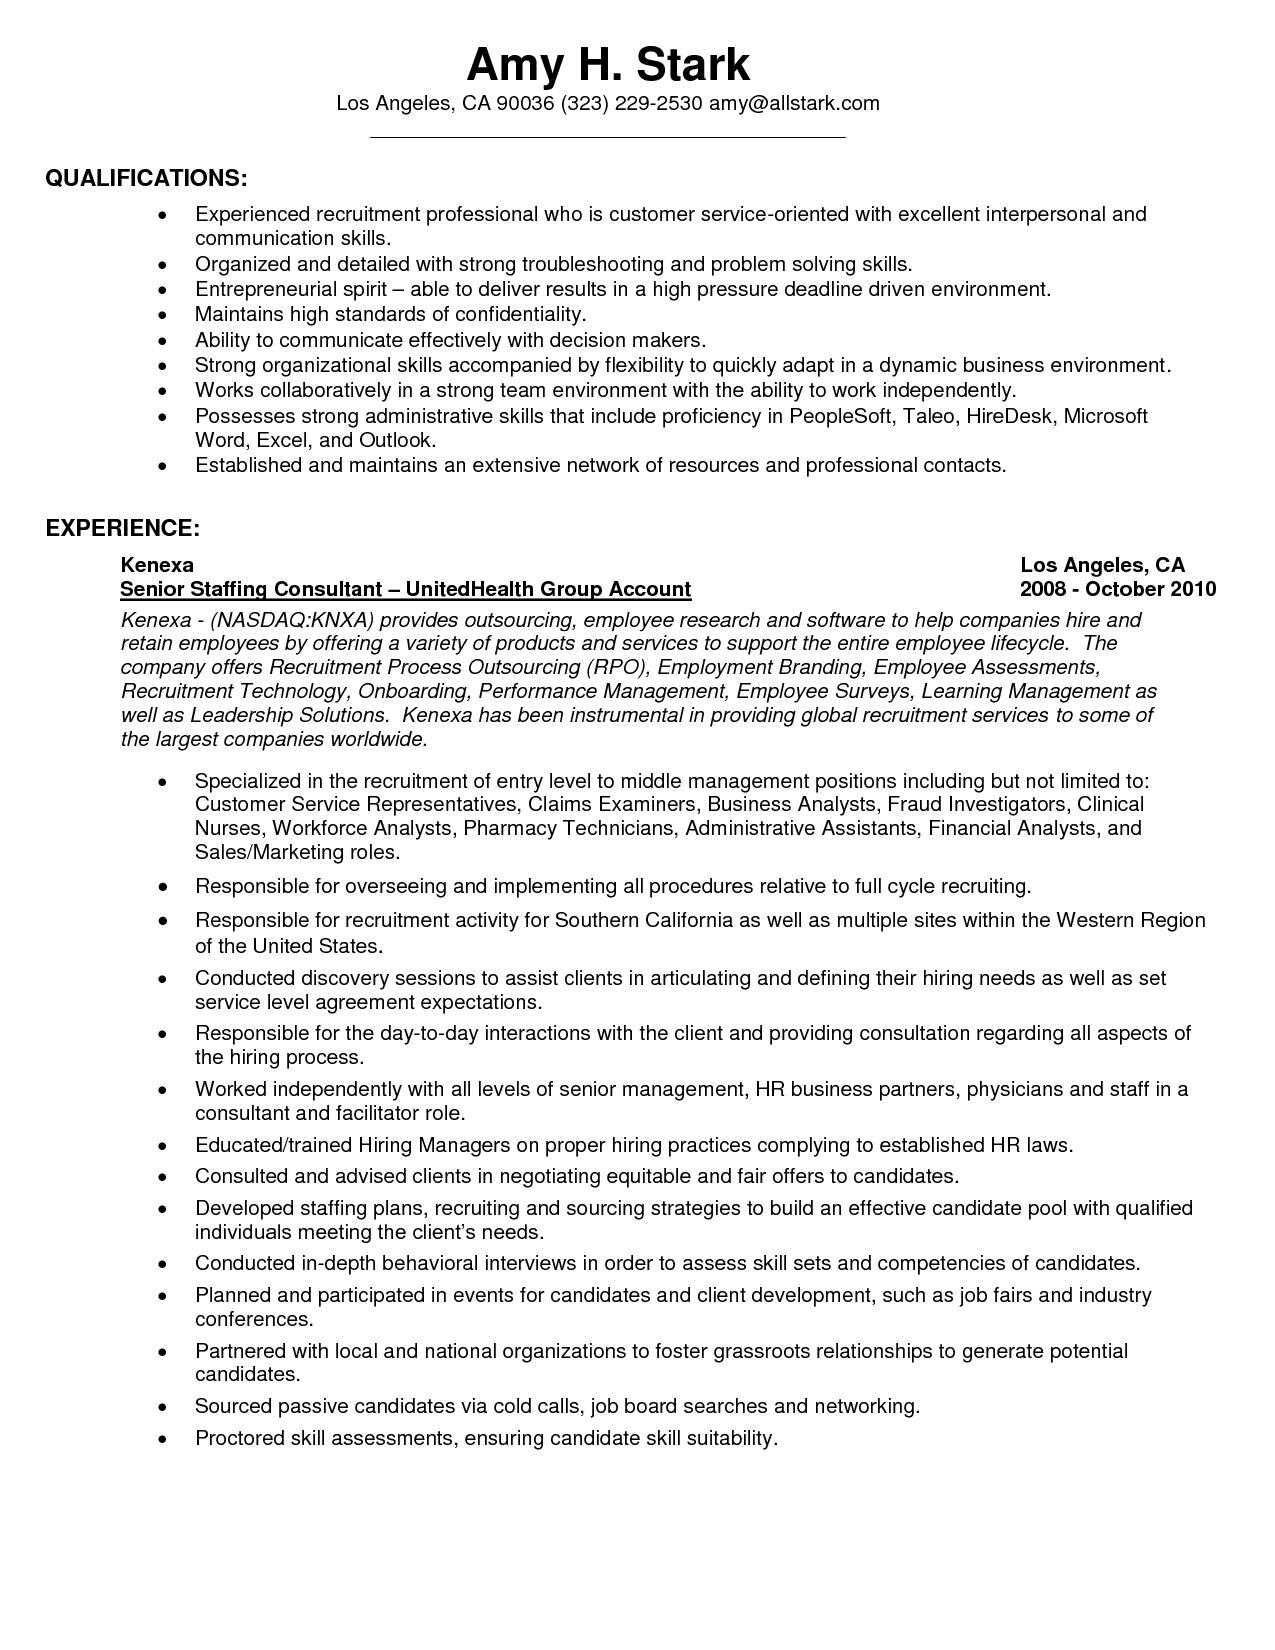 Customer Service Sample Resume Skills